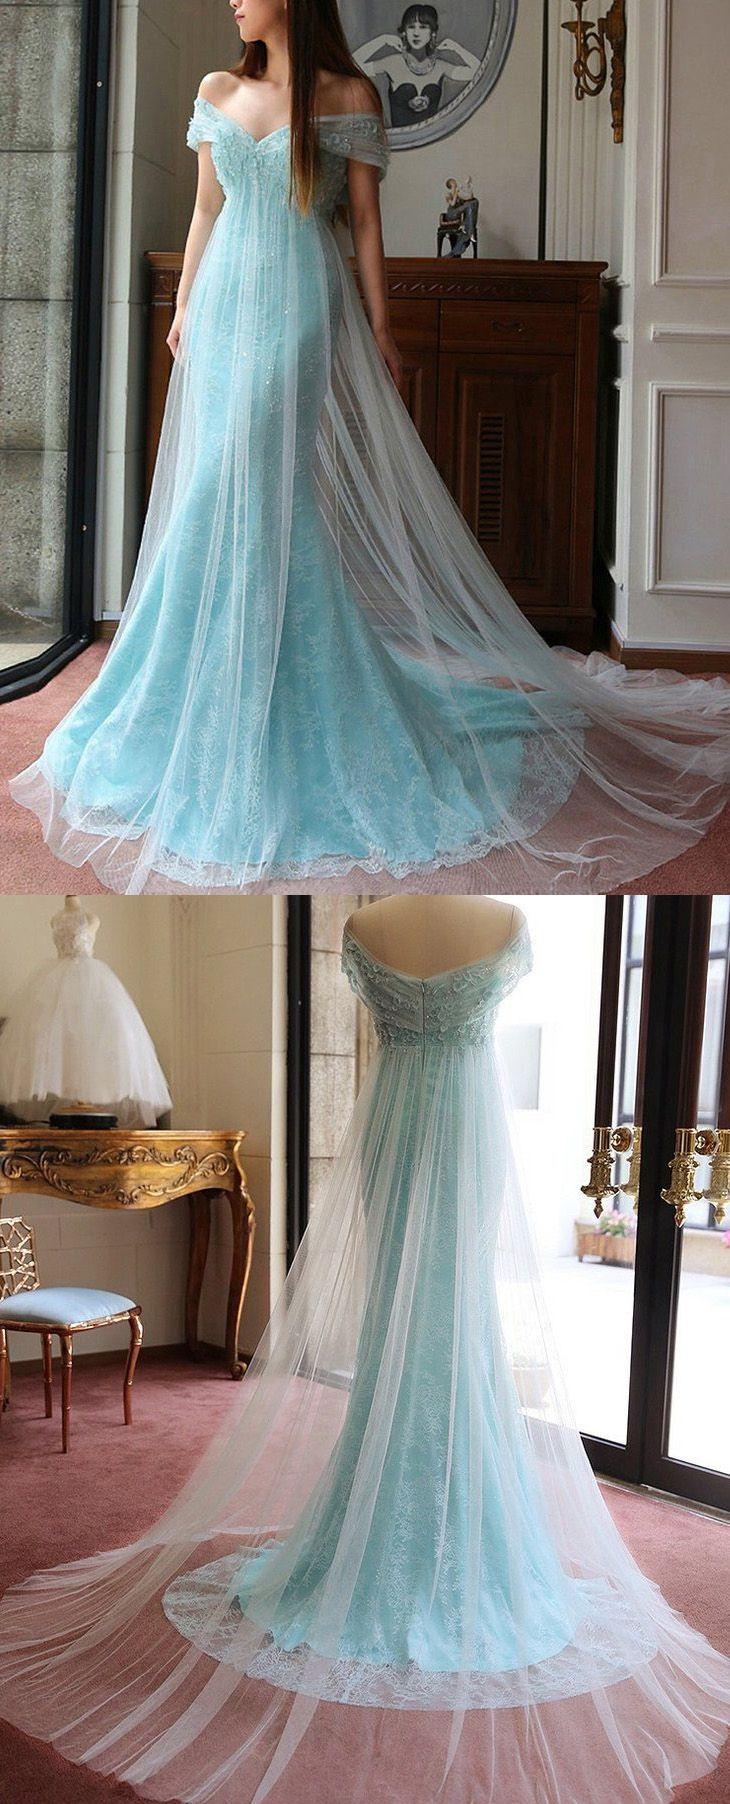 Custom made sleeveless dresses long light blue evening prom dresses